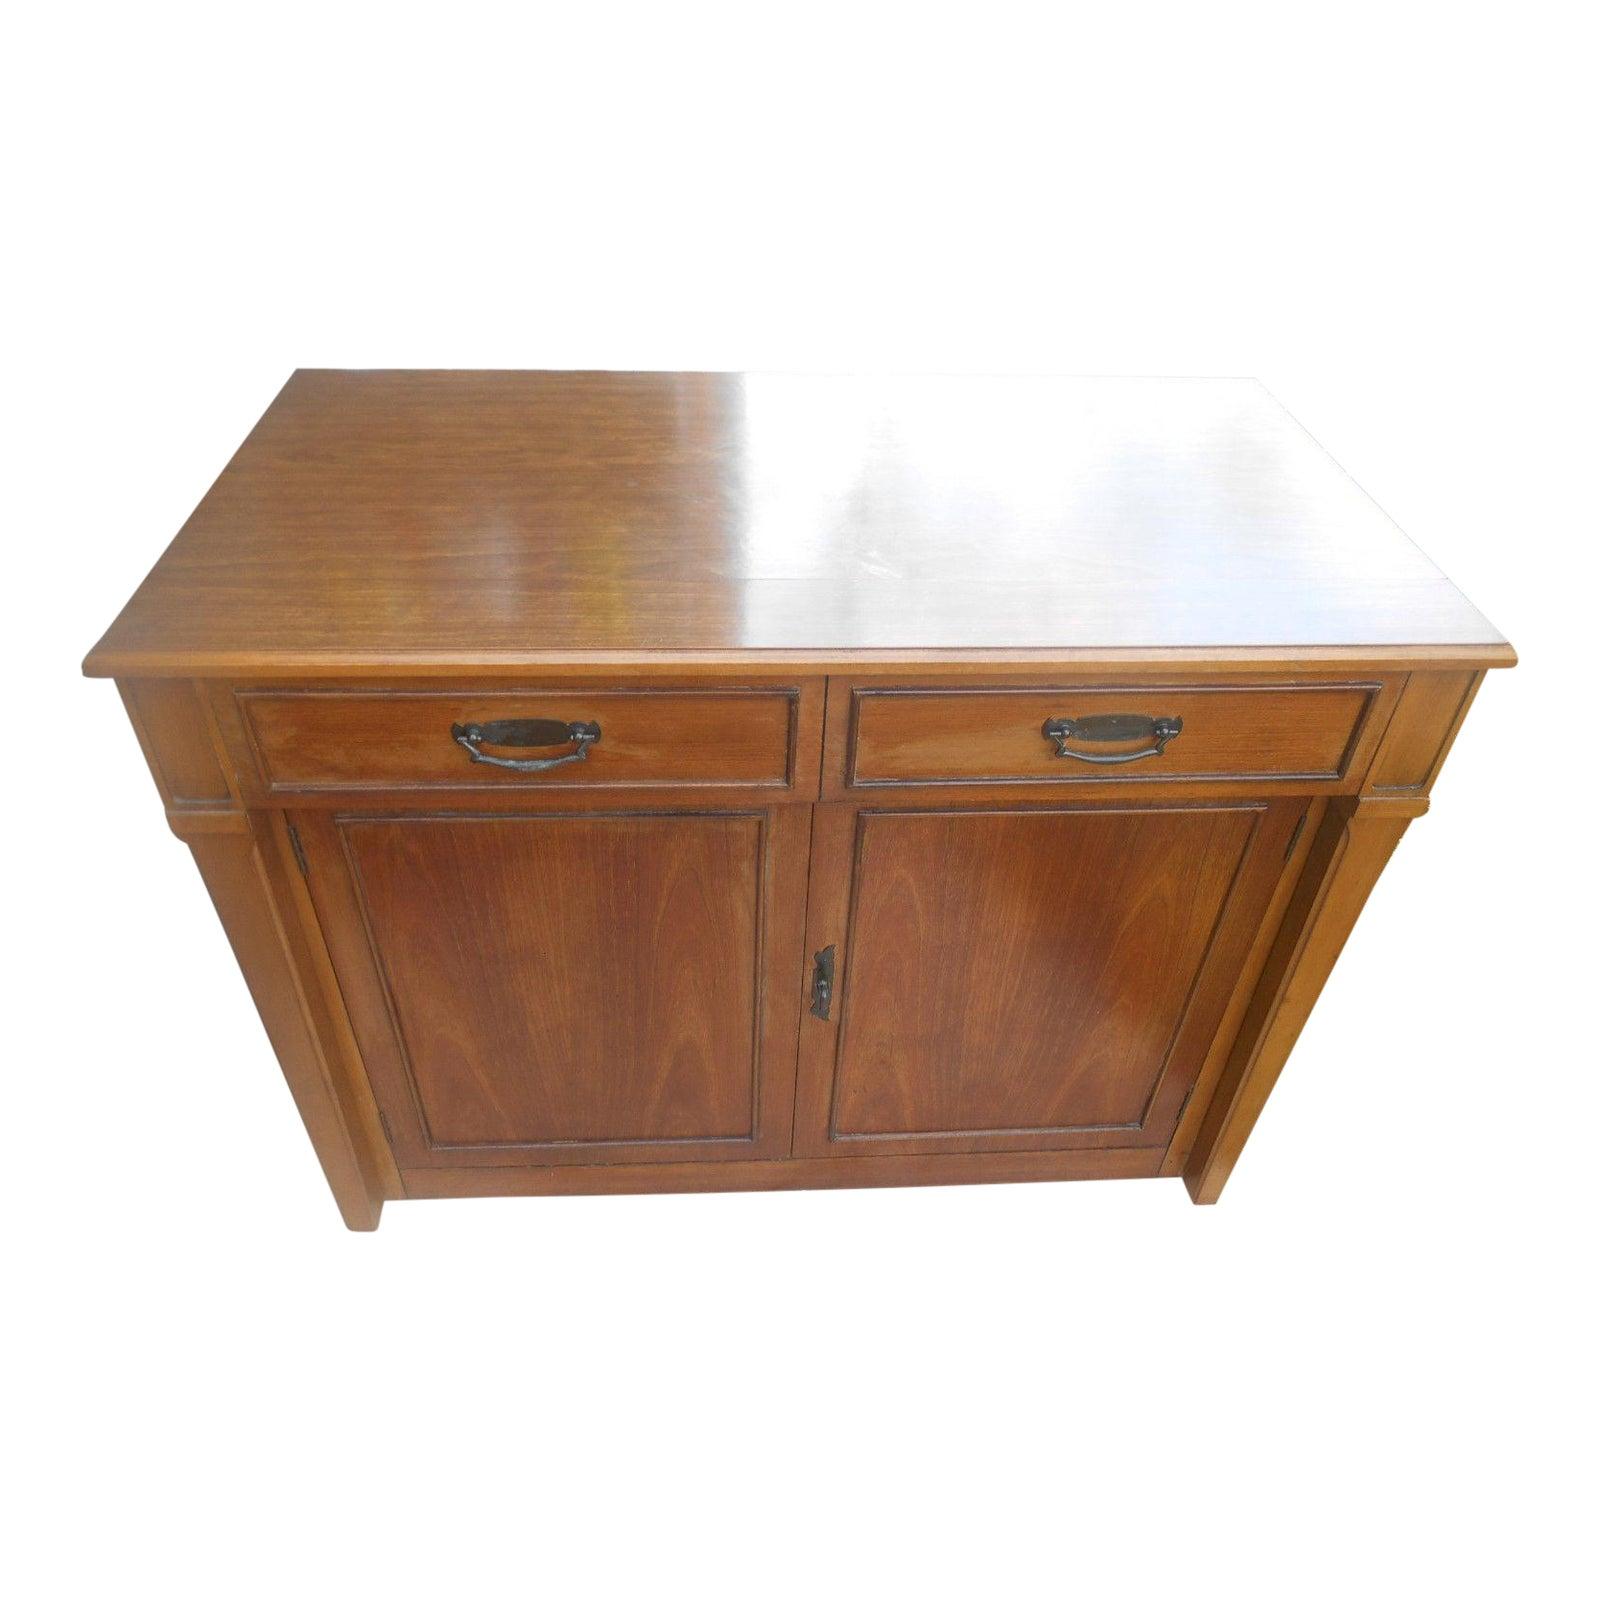 Rare Mid Century Modern Saginaw Furniture 9 1 2 Ft Extending Dining Buffet Table Chairish